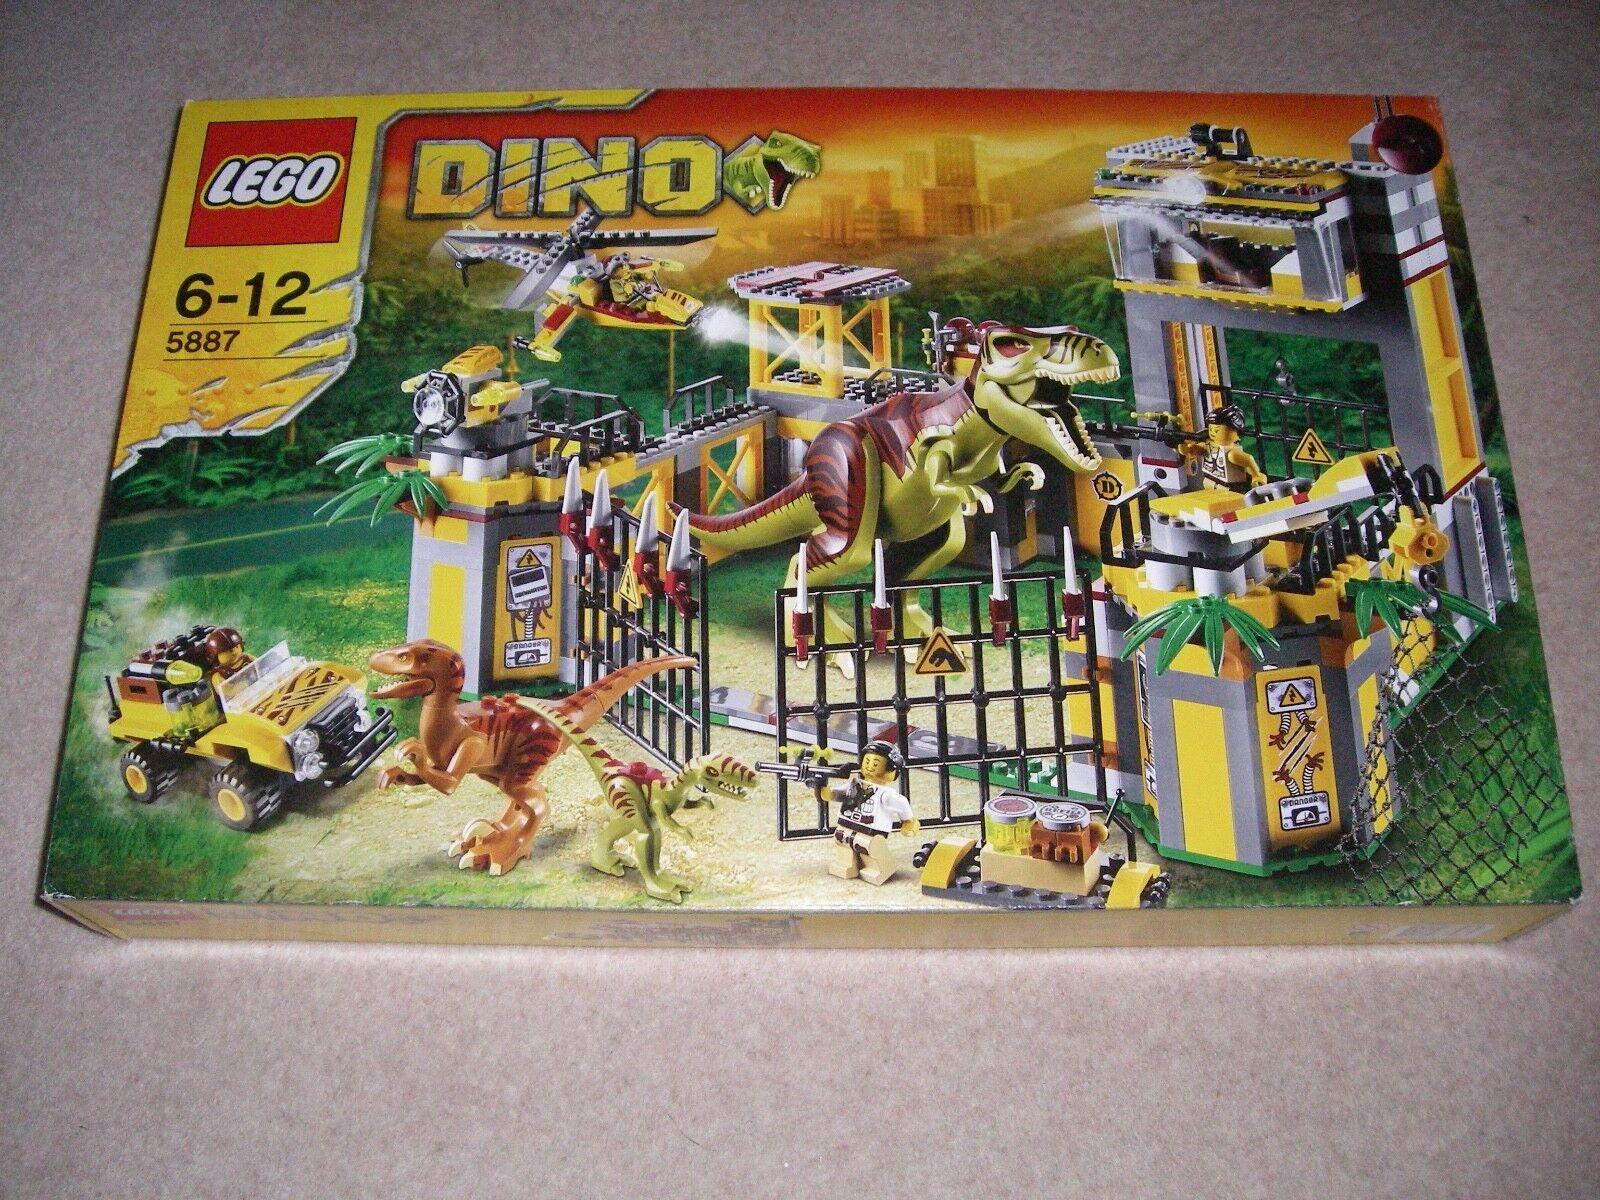 New Lego Dino Defense HQ 5887, Similar Jurassic World, Retired, Sealed